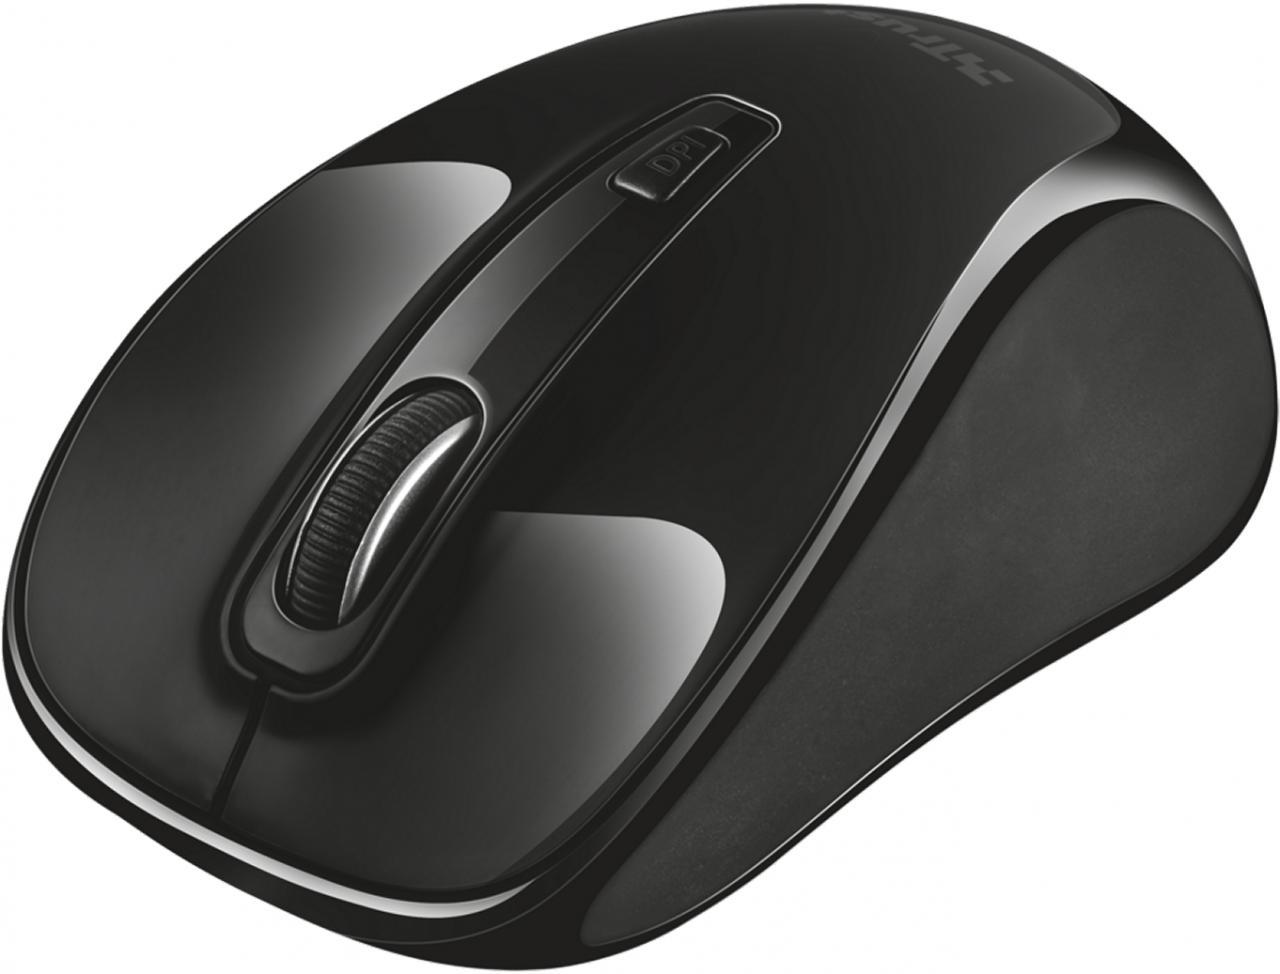 TRUST myš TRUST Xani Optical Bluetooth Mouse - Black (21192)